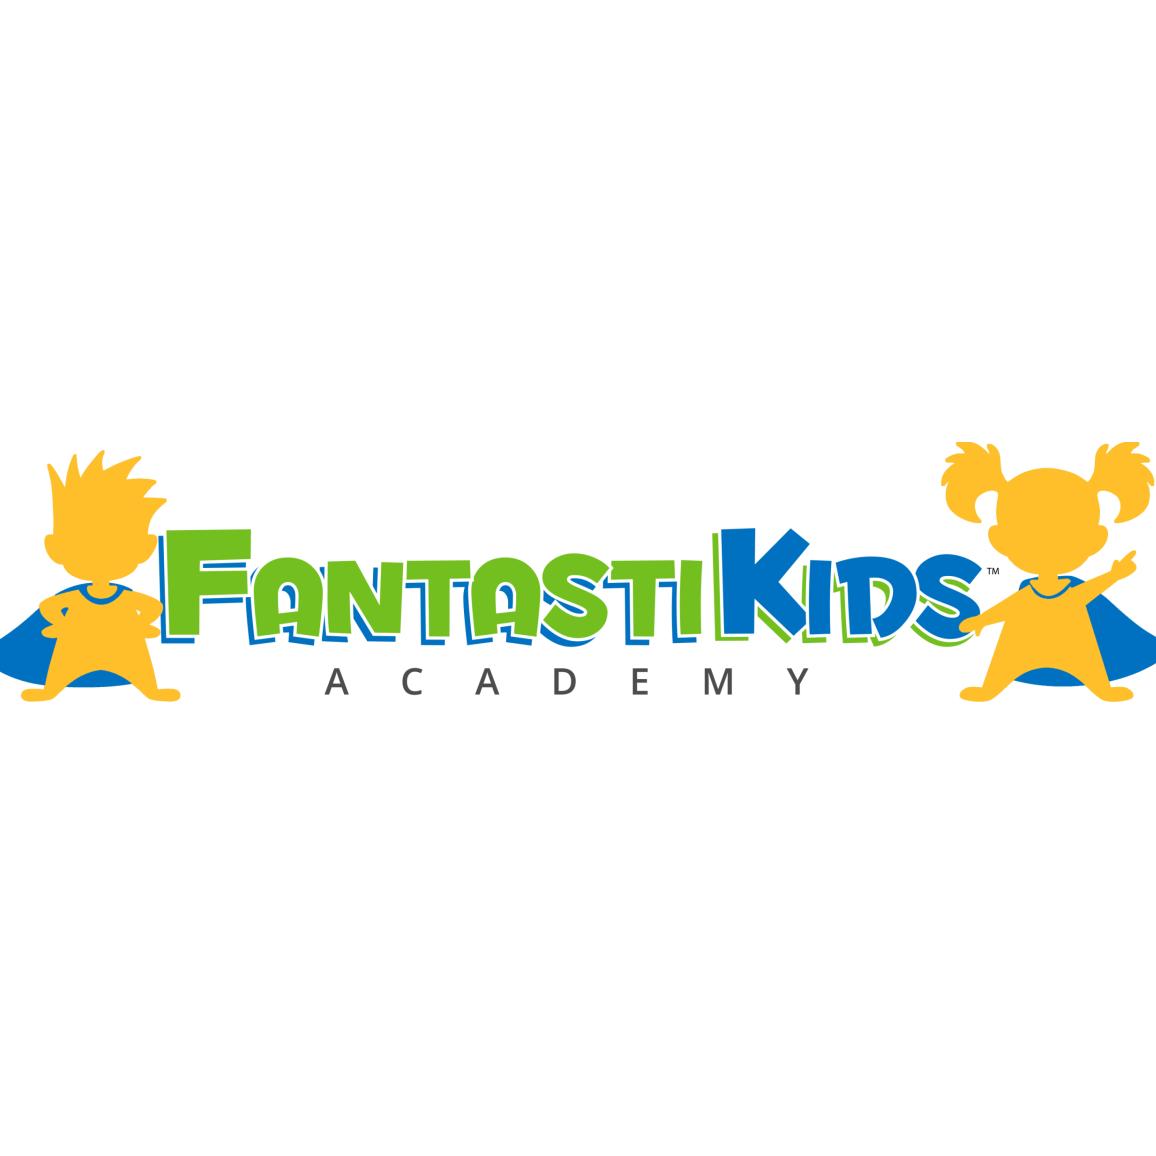 Fantastikids Academy